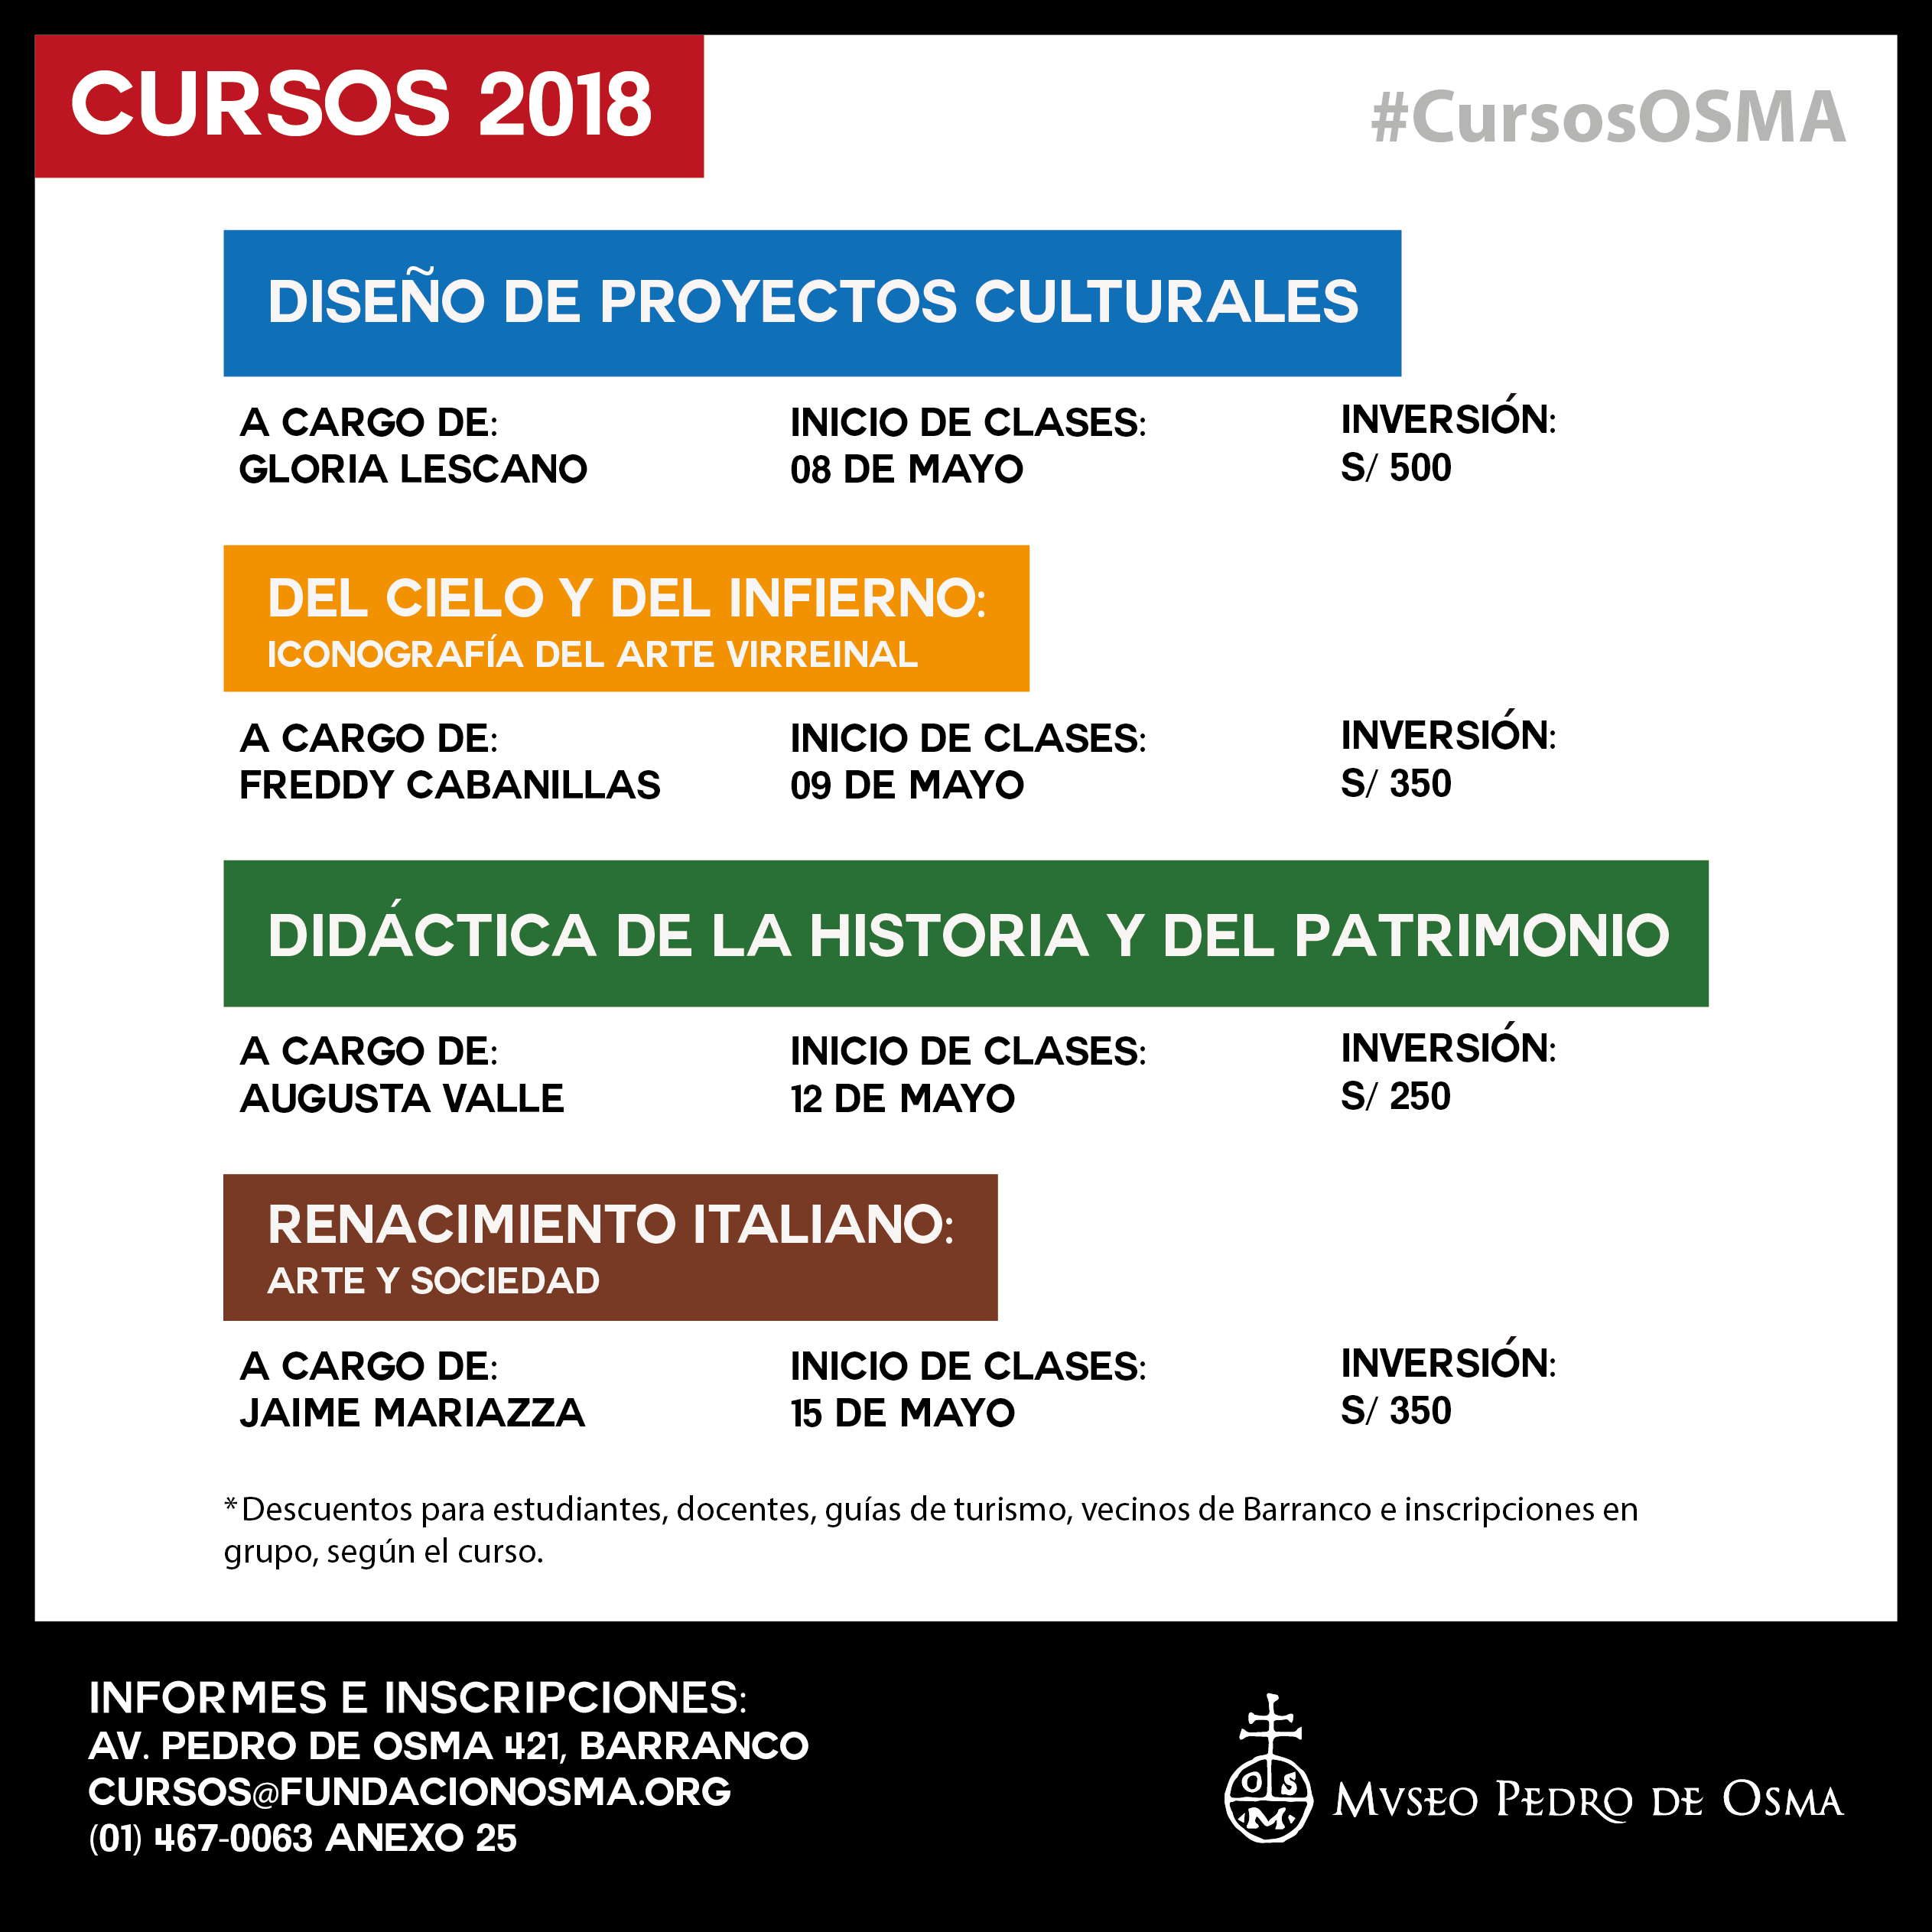 Cursos Osma 2018